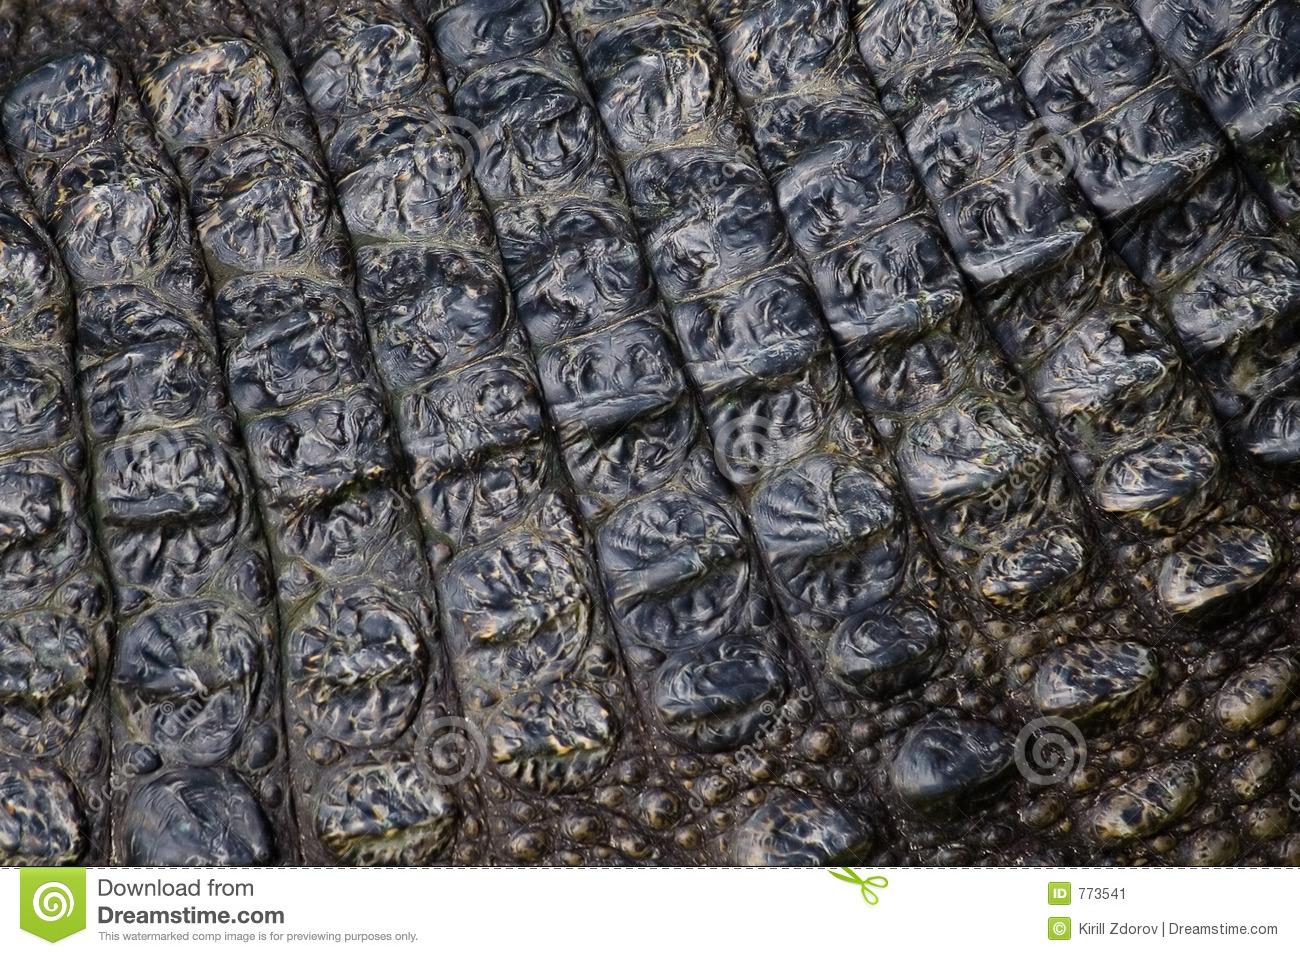 32 Crocodile Skin Wallpapers 1300x956